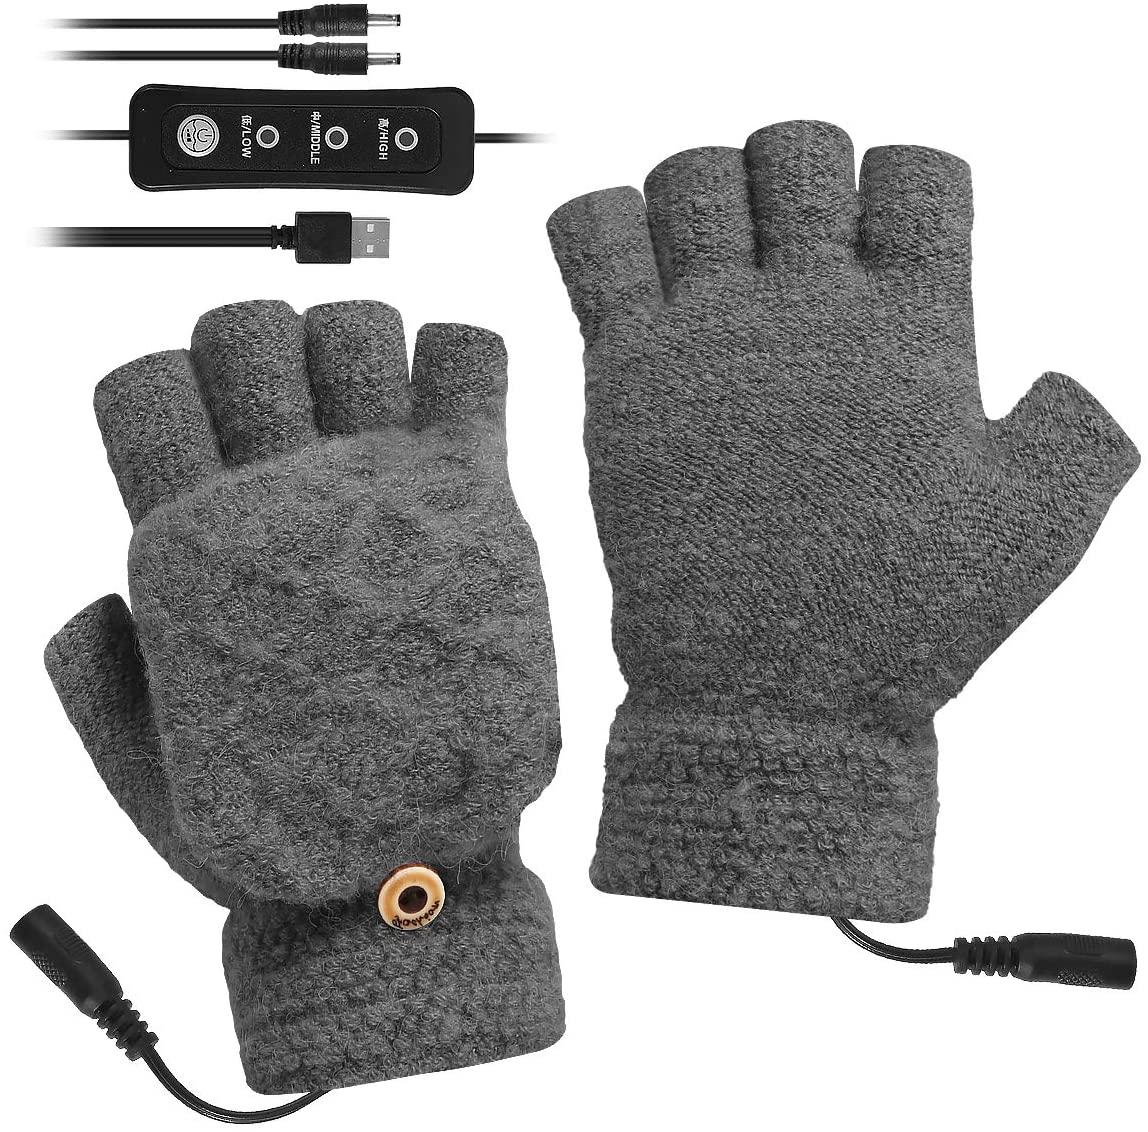 USB Heated Hand Gloves - WorkwearToronto.com - Chritmas Gift Ideas 2020 - Corporate Christmas Gifts - Amazon